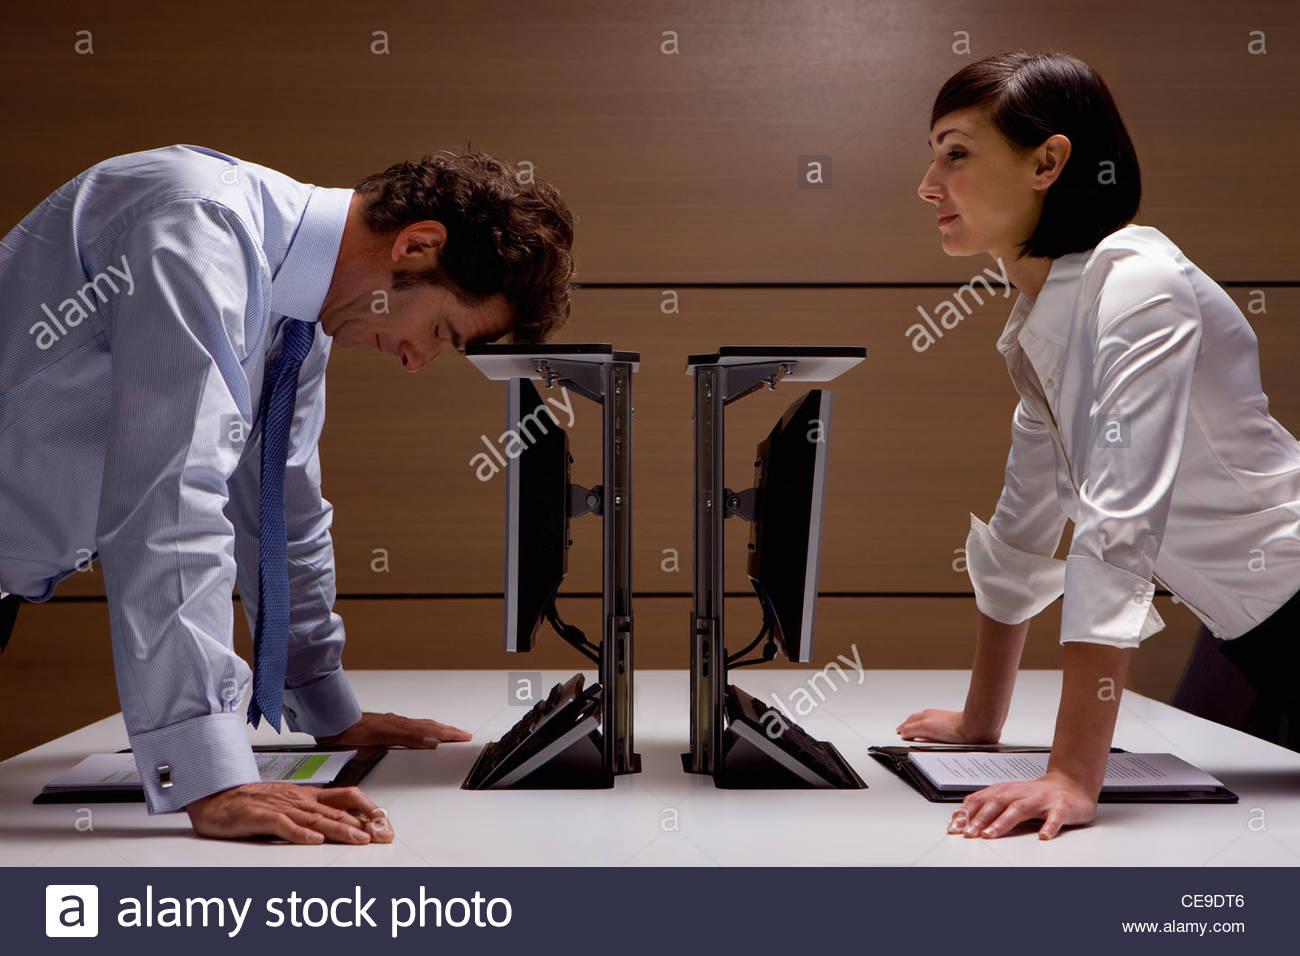 Businesswoman regardant businessman lean on computer in office Photo Stock